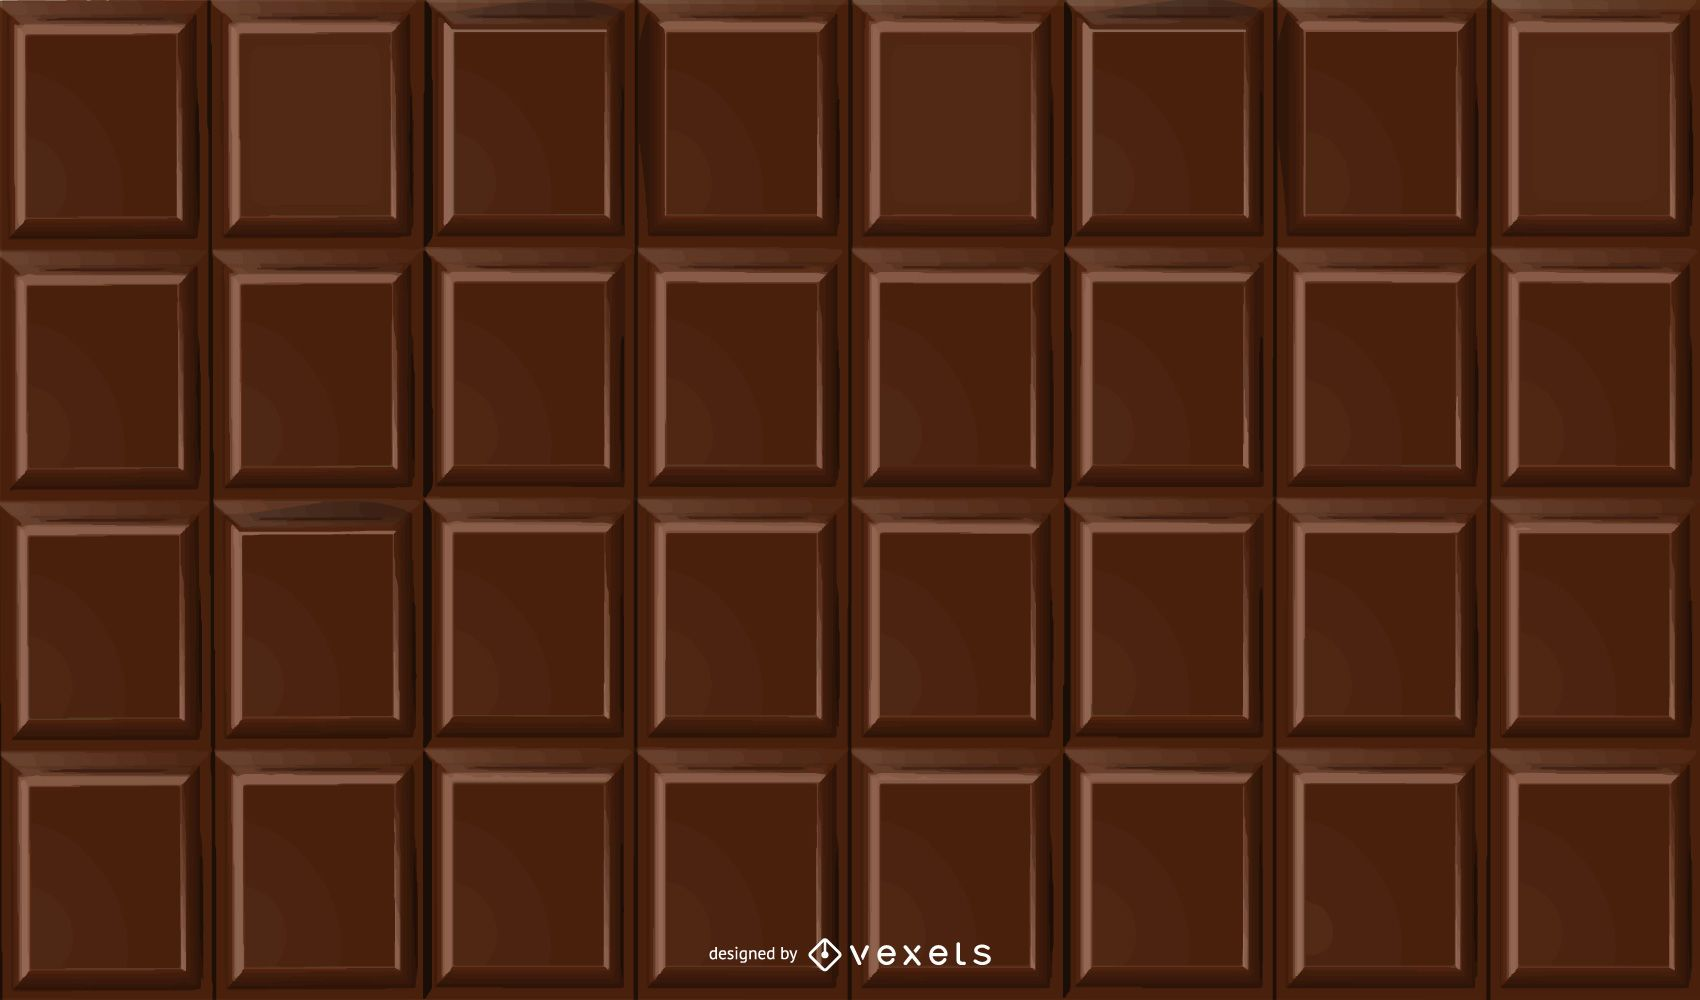 Fondo de barra de chocolate fragante